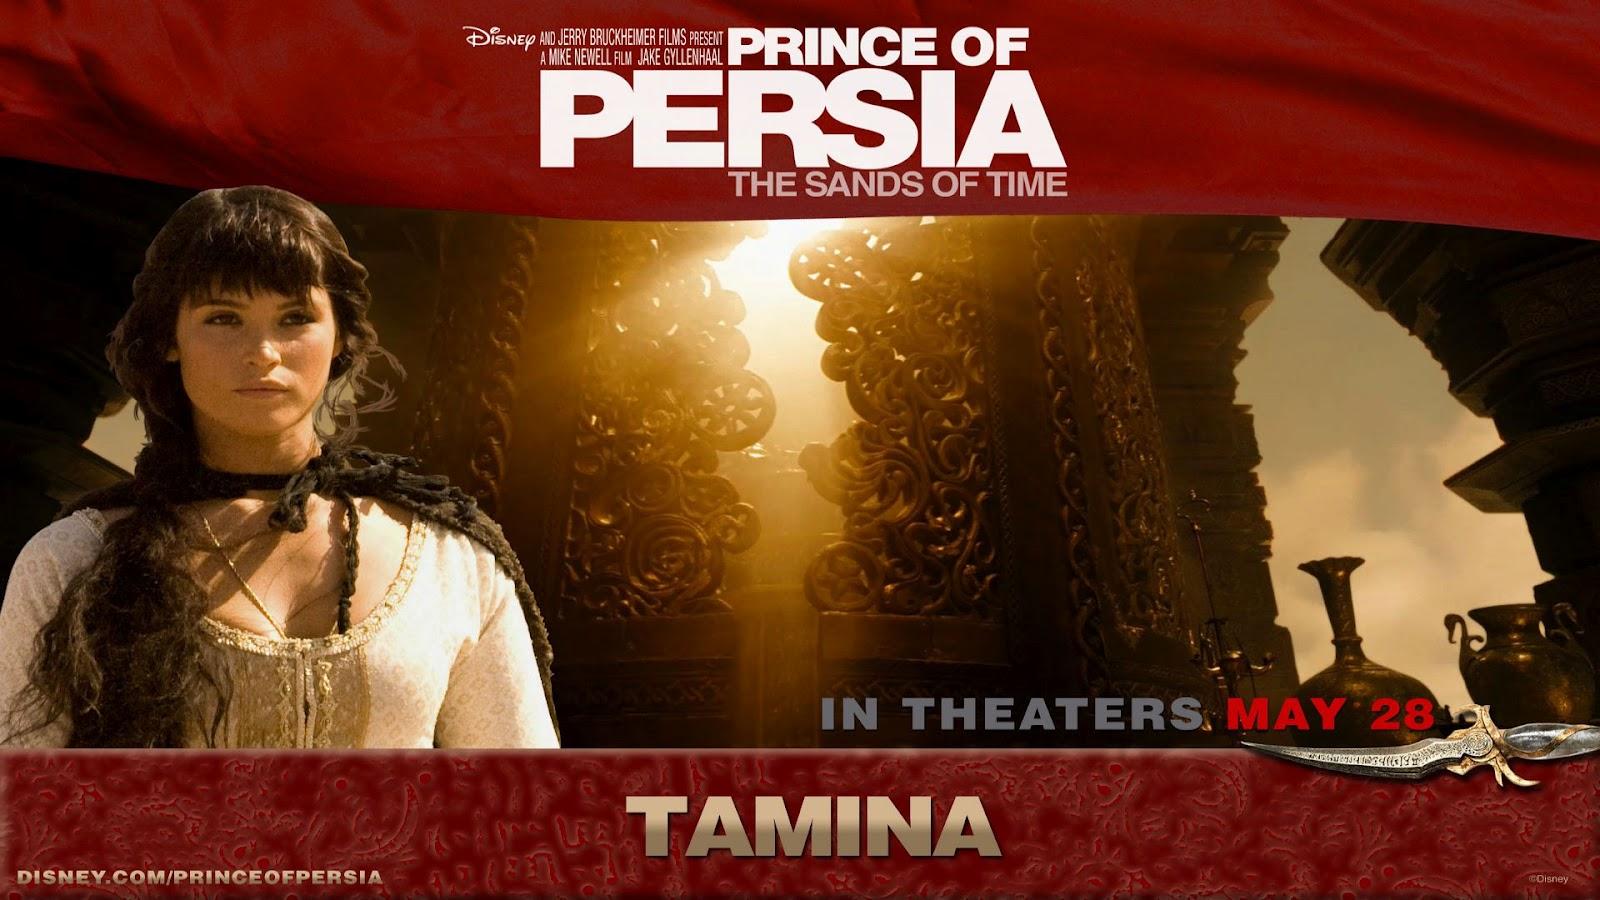 http://1.bp.blogspot.com/-jCNPHgf-3u8/UBKnUDh2uWI/AAAAAAAADG4/vmebfWSYTvU/s1600/gemma-arterton-in-prince-of-persia-the-sands-of-time-wallpaper-2_1920x1080_78158.jpg